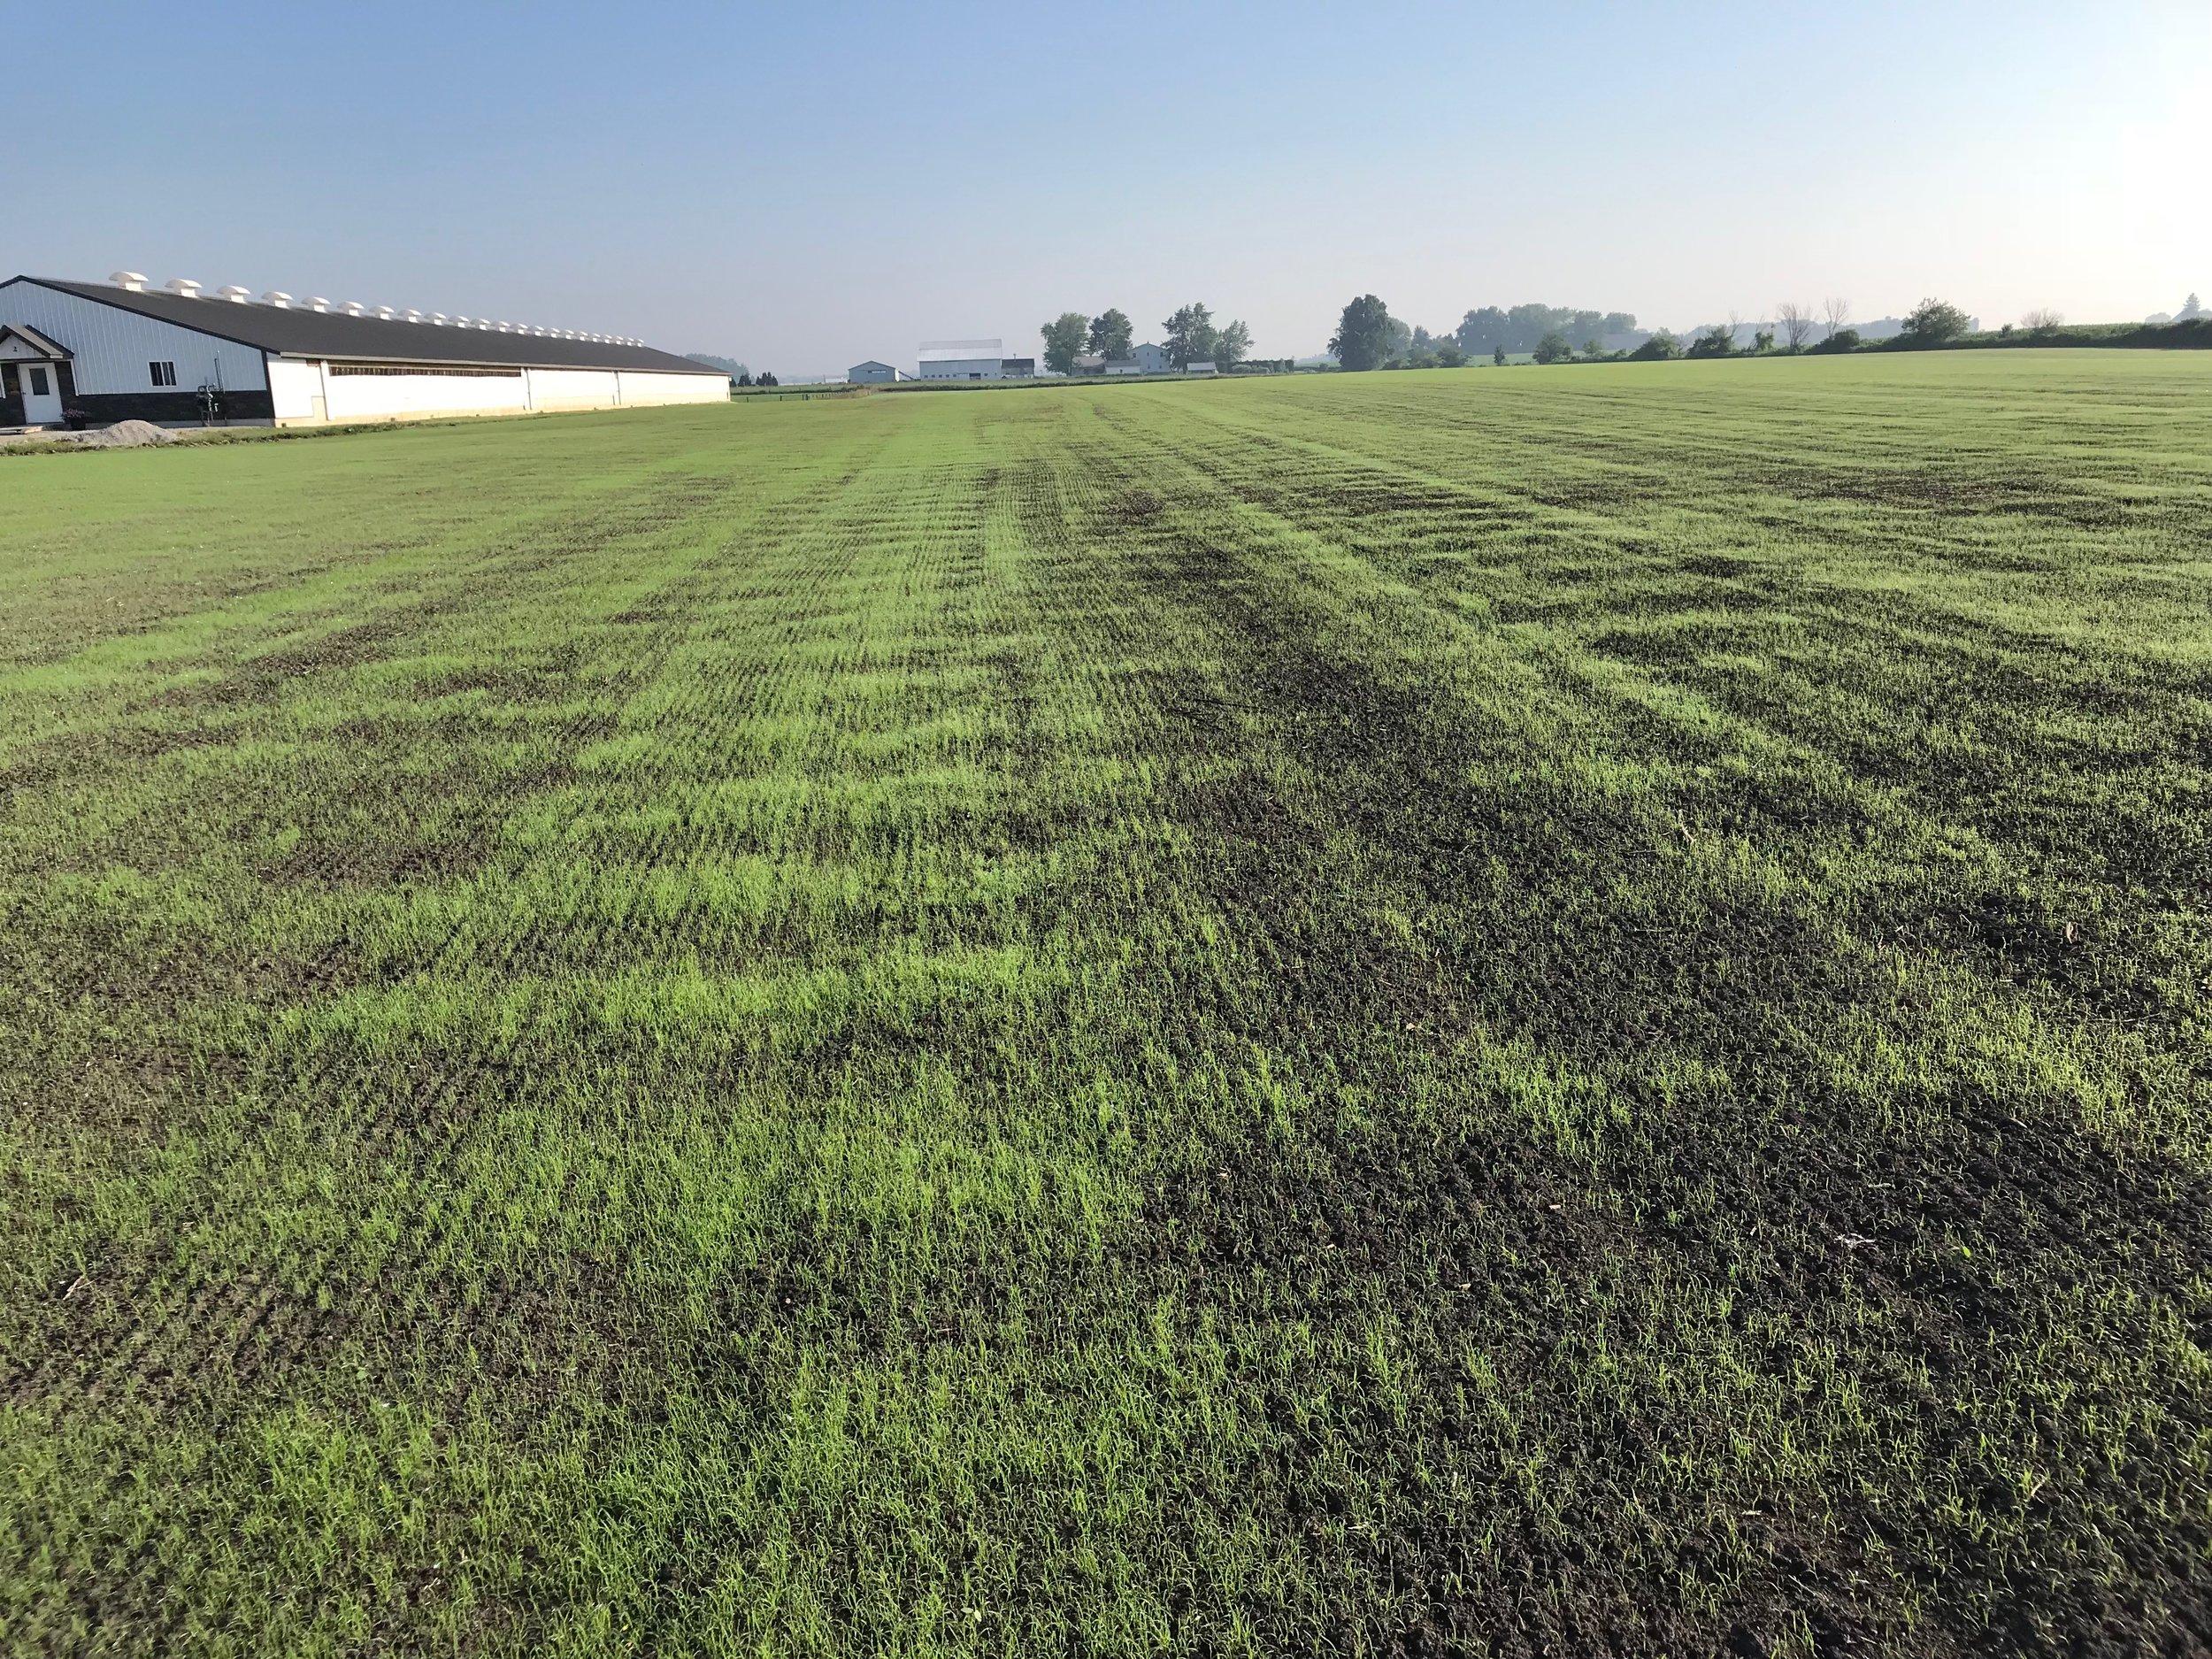 2018.6.28 - Teff - Bremen - 13 days after planting3.JPG